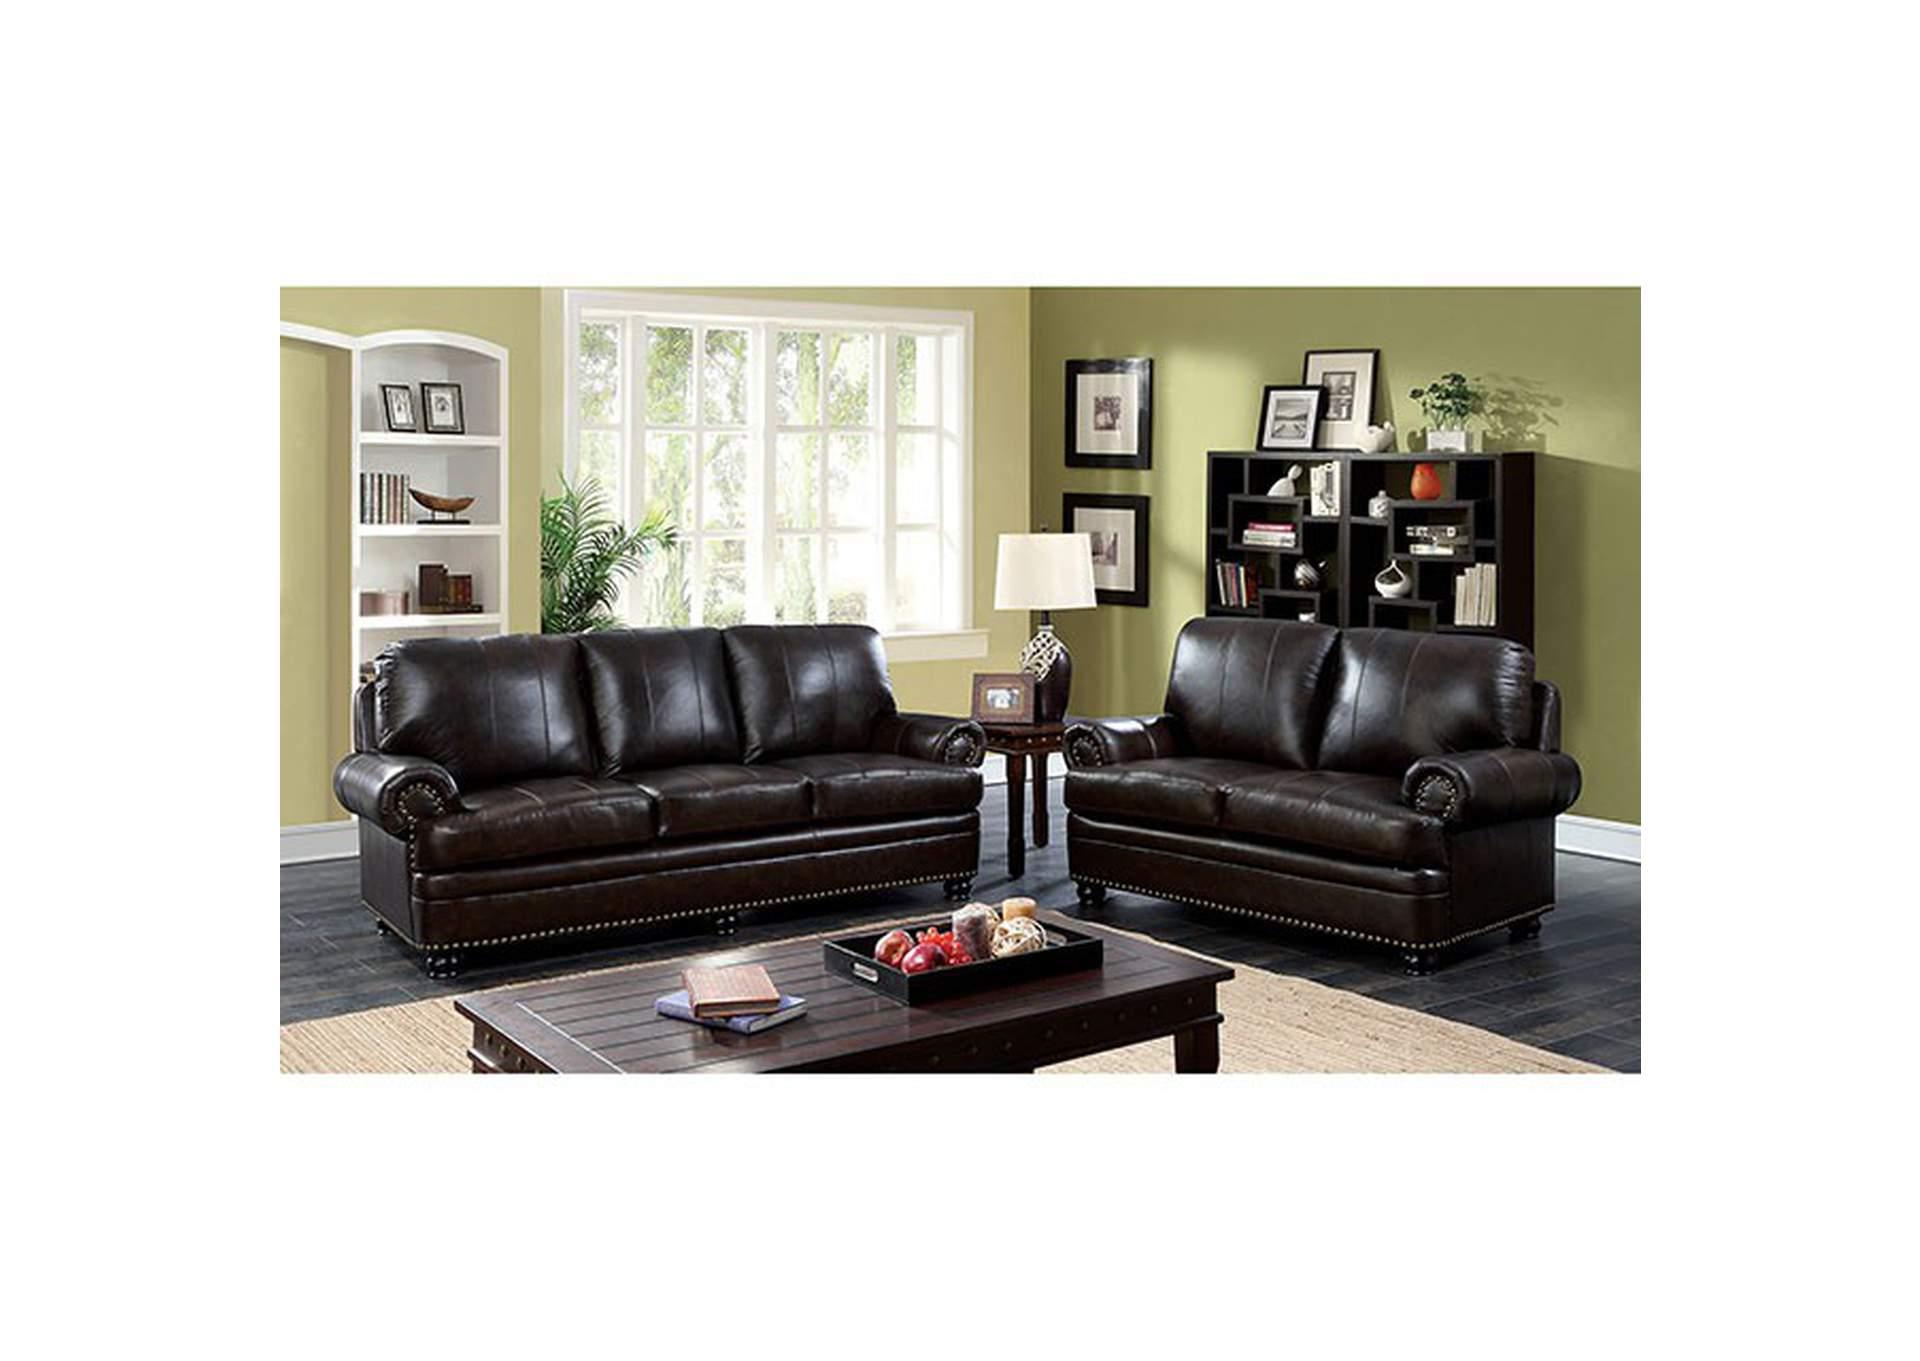 Palace Furniture Reinhardt Dark Brown Sofa And Loveseat